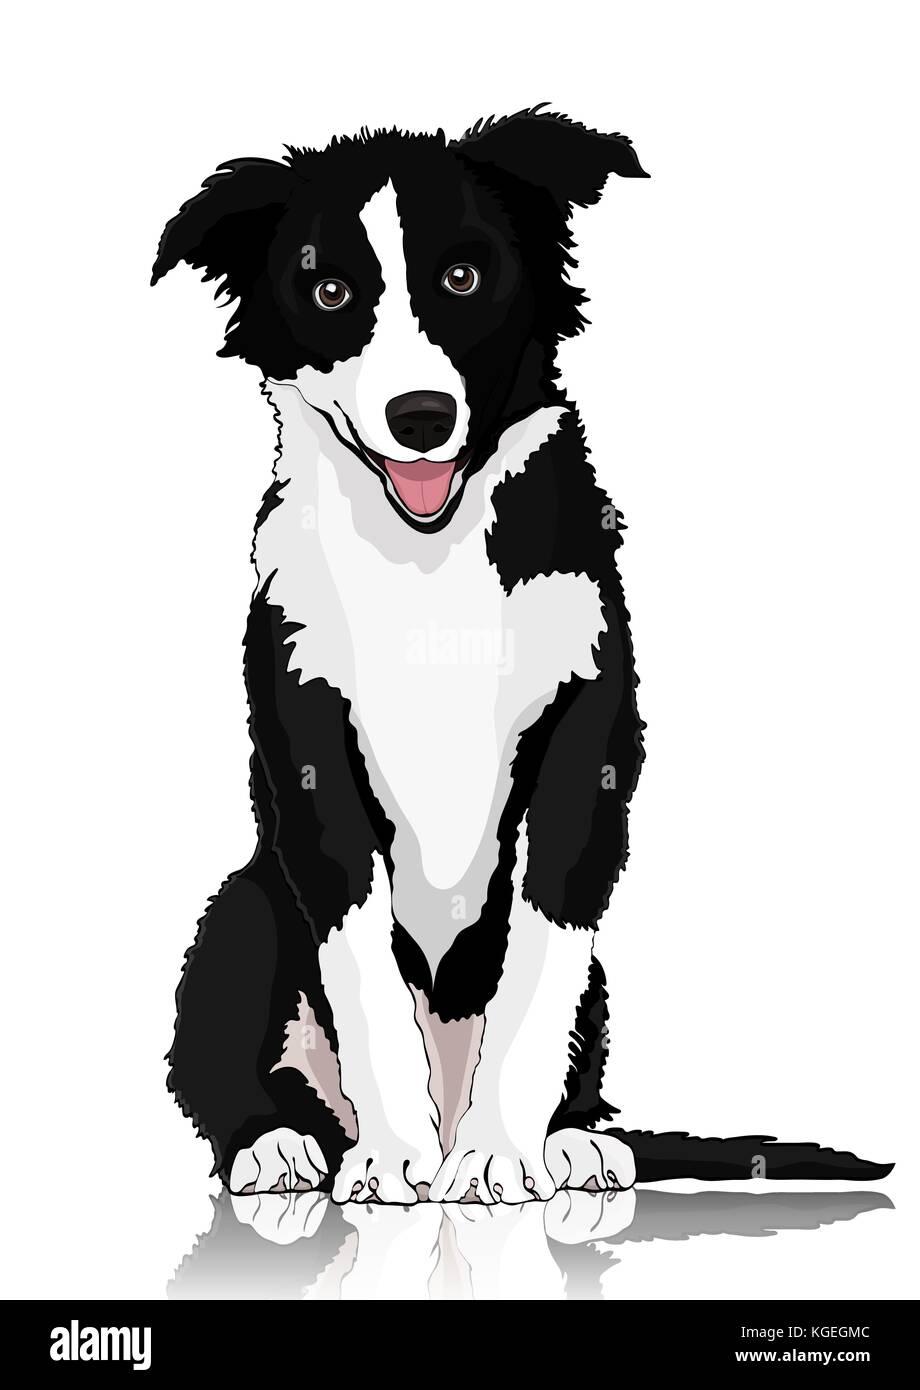 Black And White Shaggy Dog